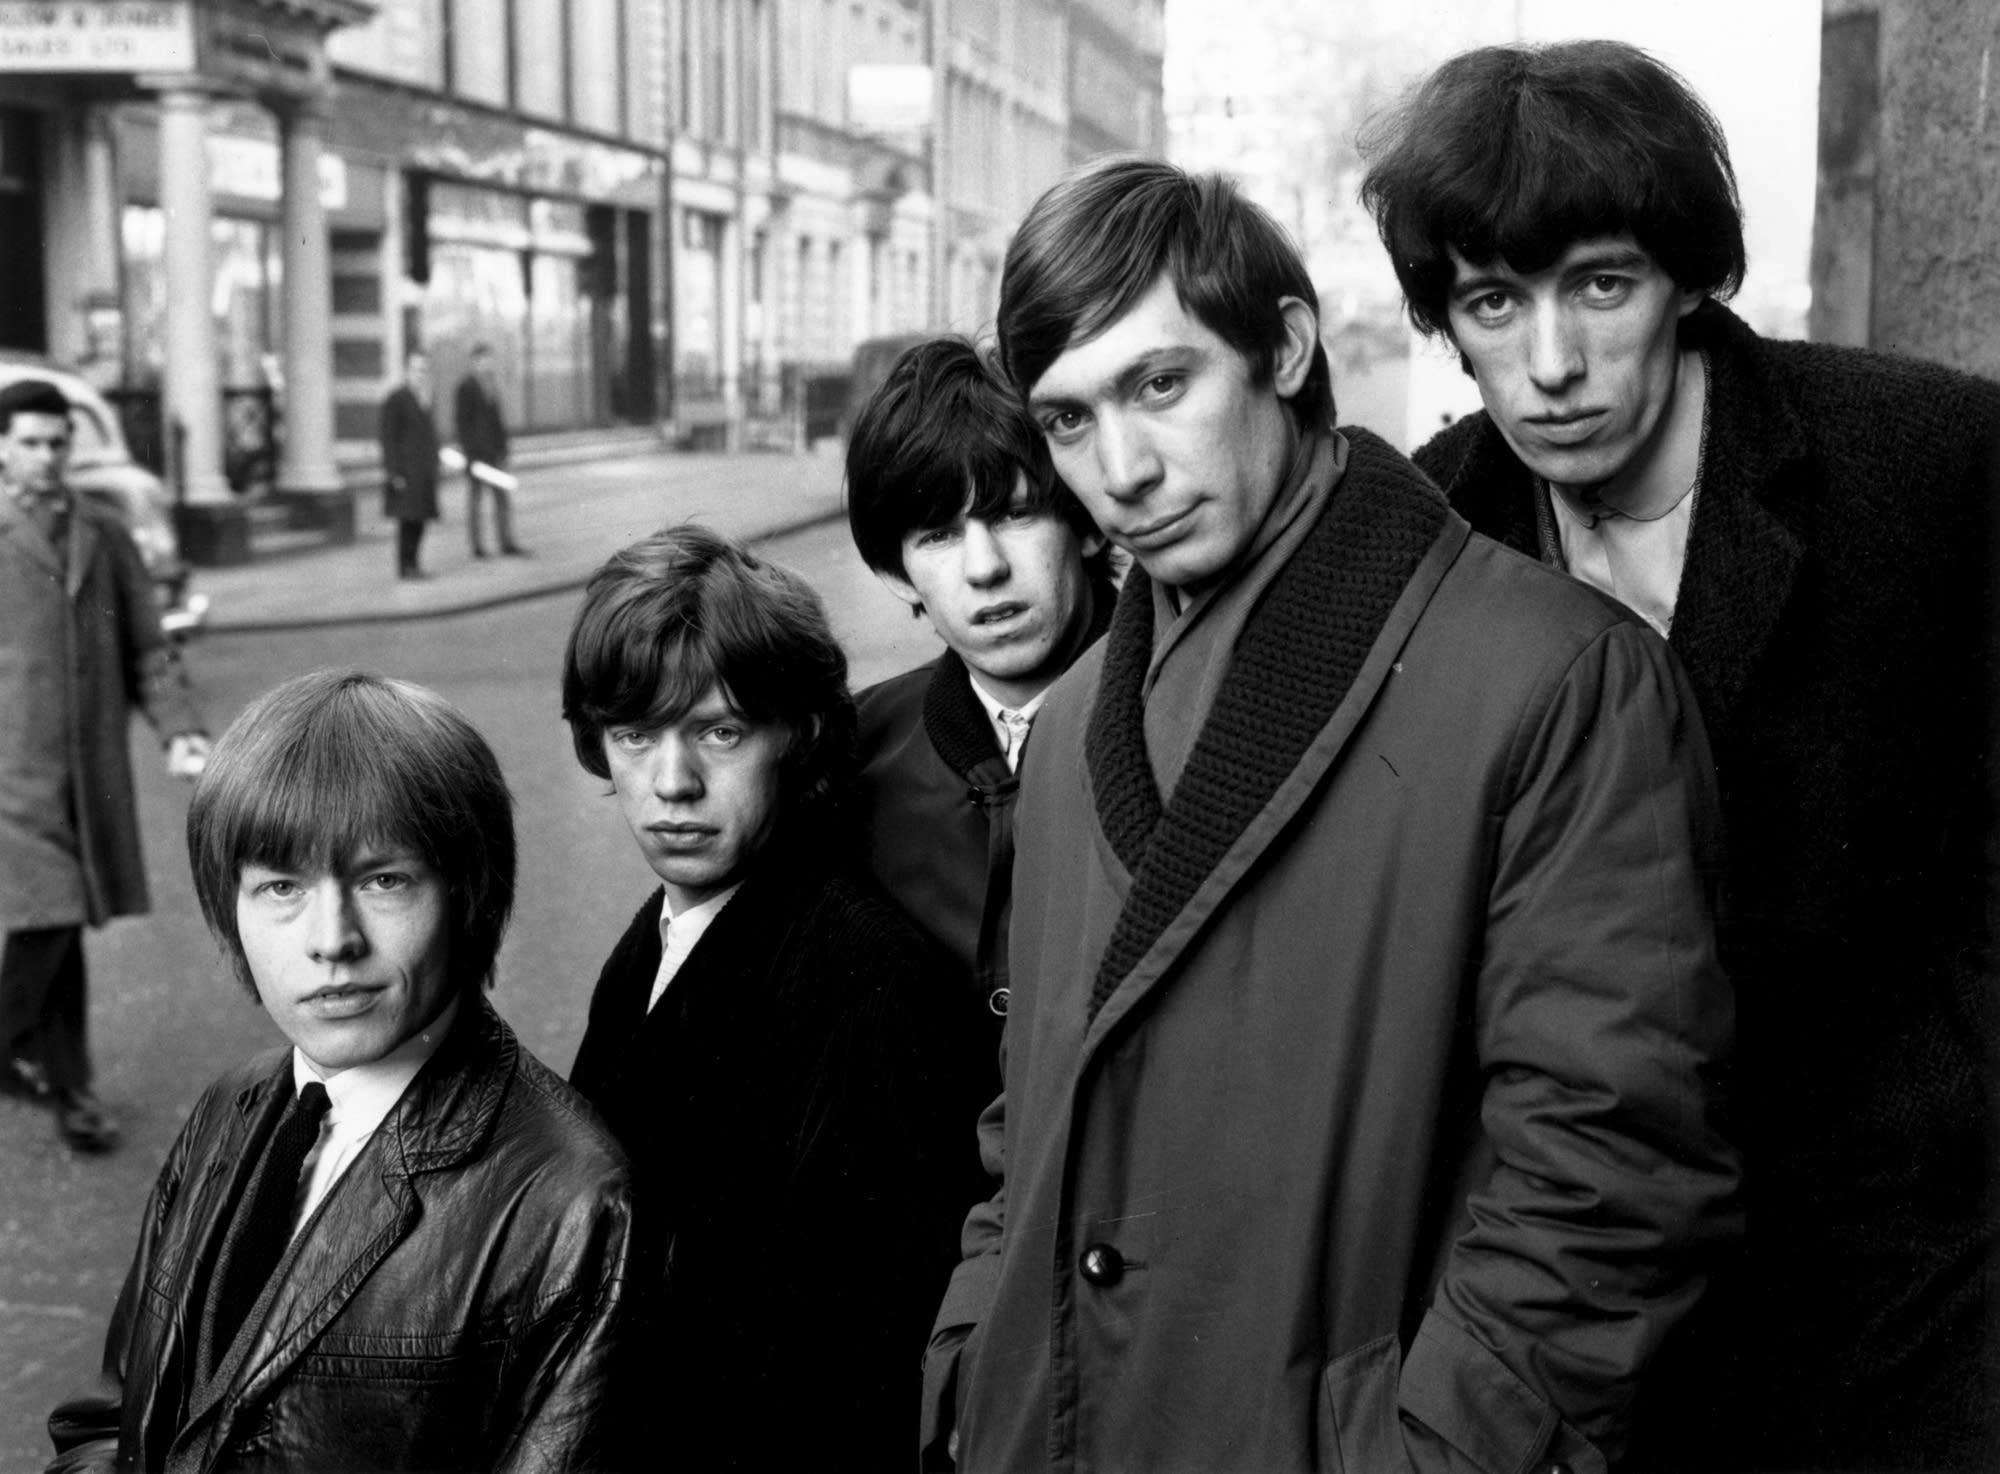 The Rolling Stones' Bill Wyman